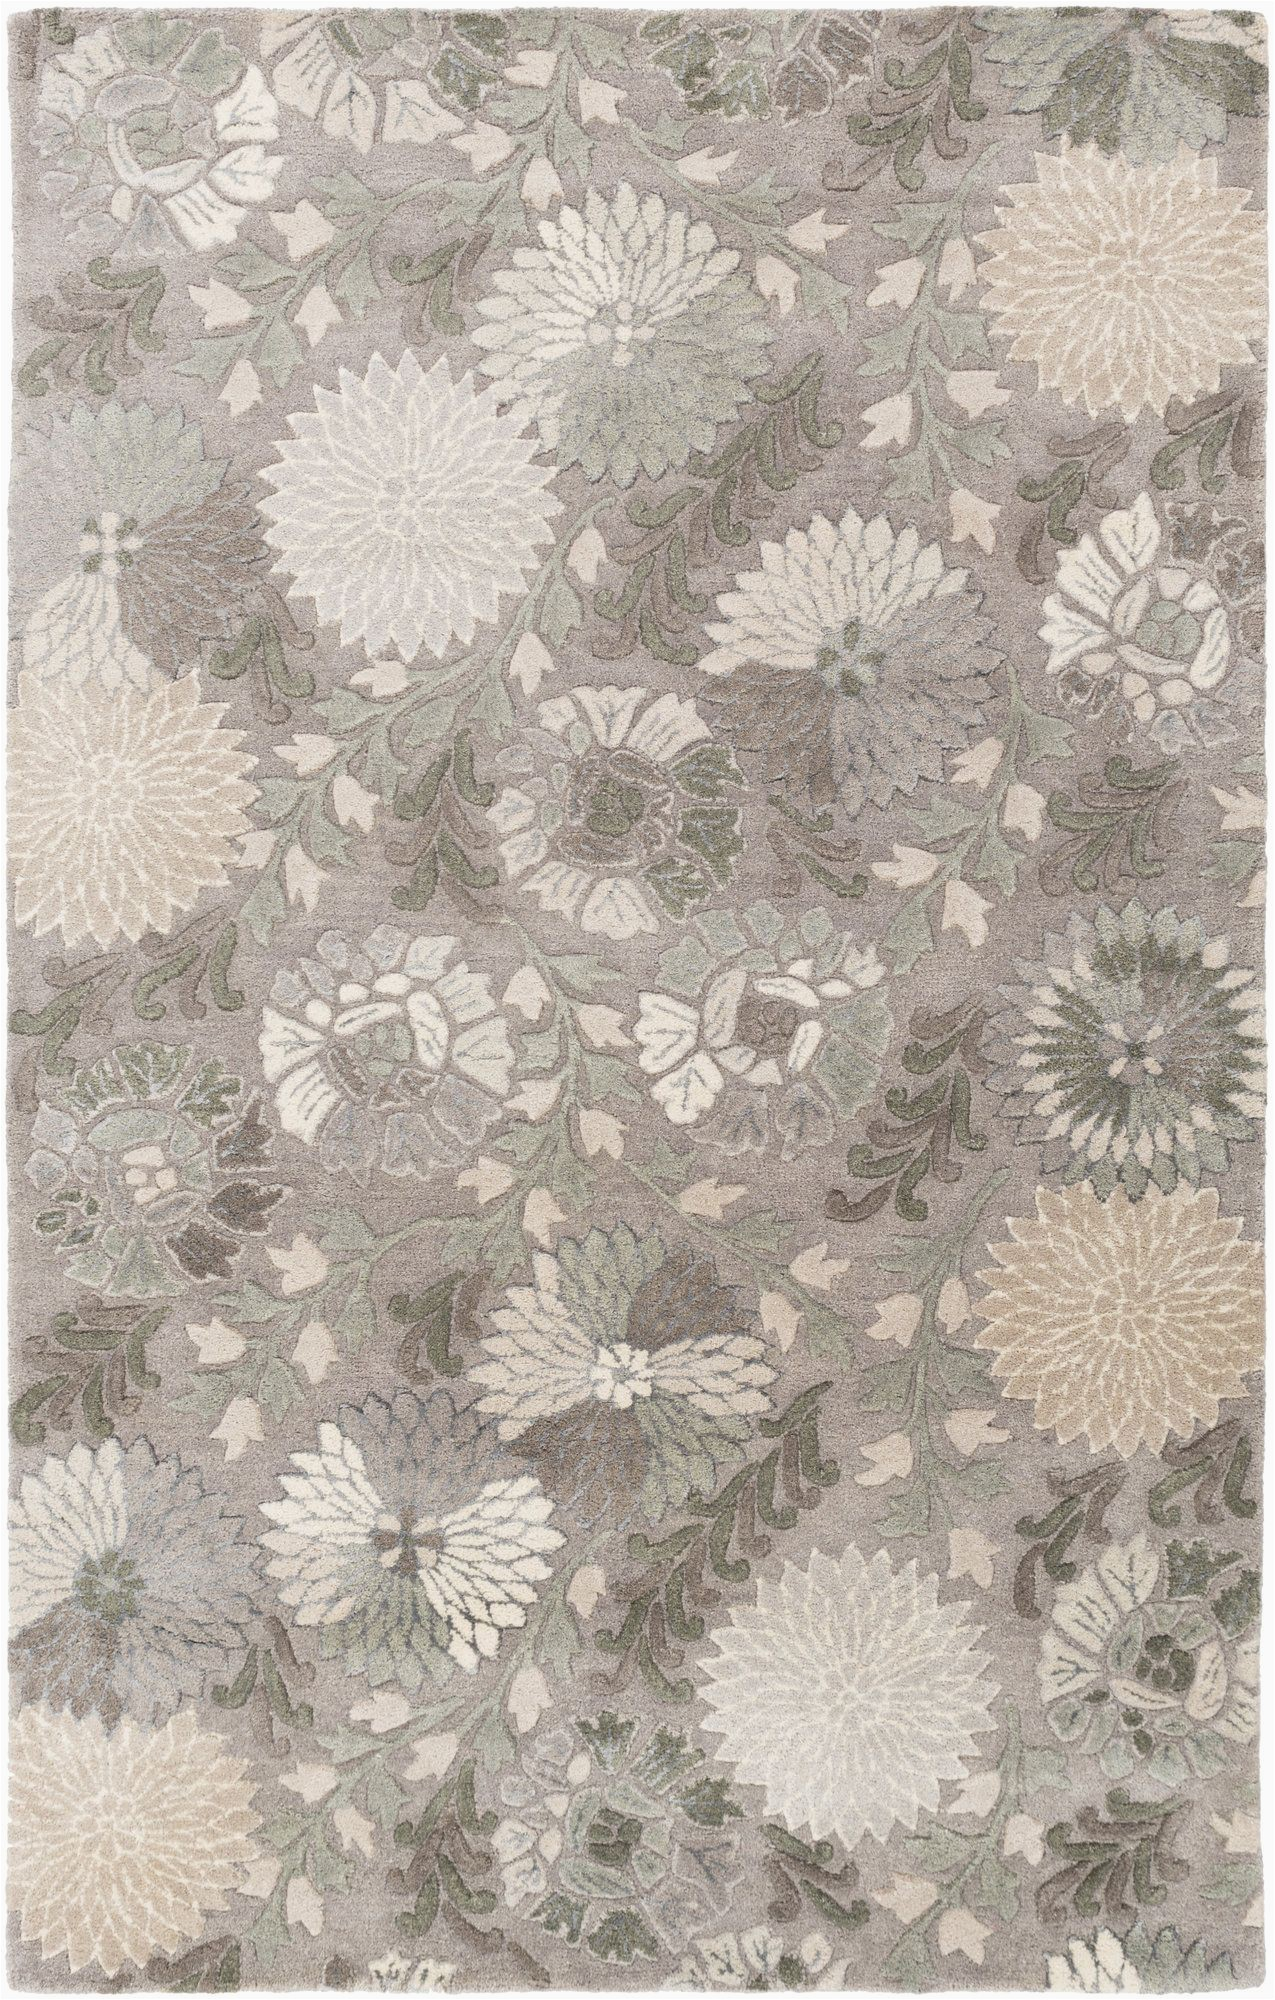 Jeannine Hand Tufted Wool Gray Ivory area Rug Keith Hand Tufted Gray area Rug